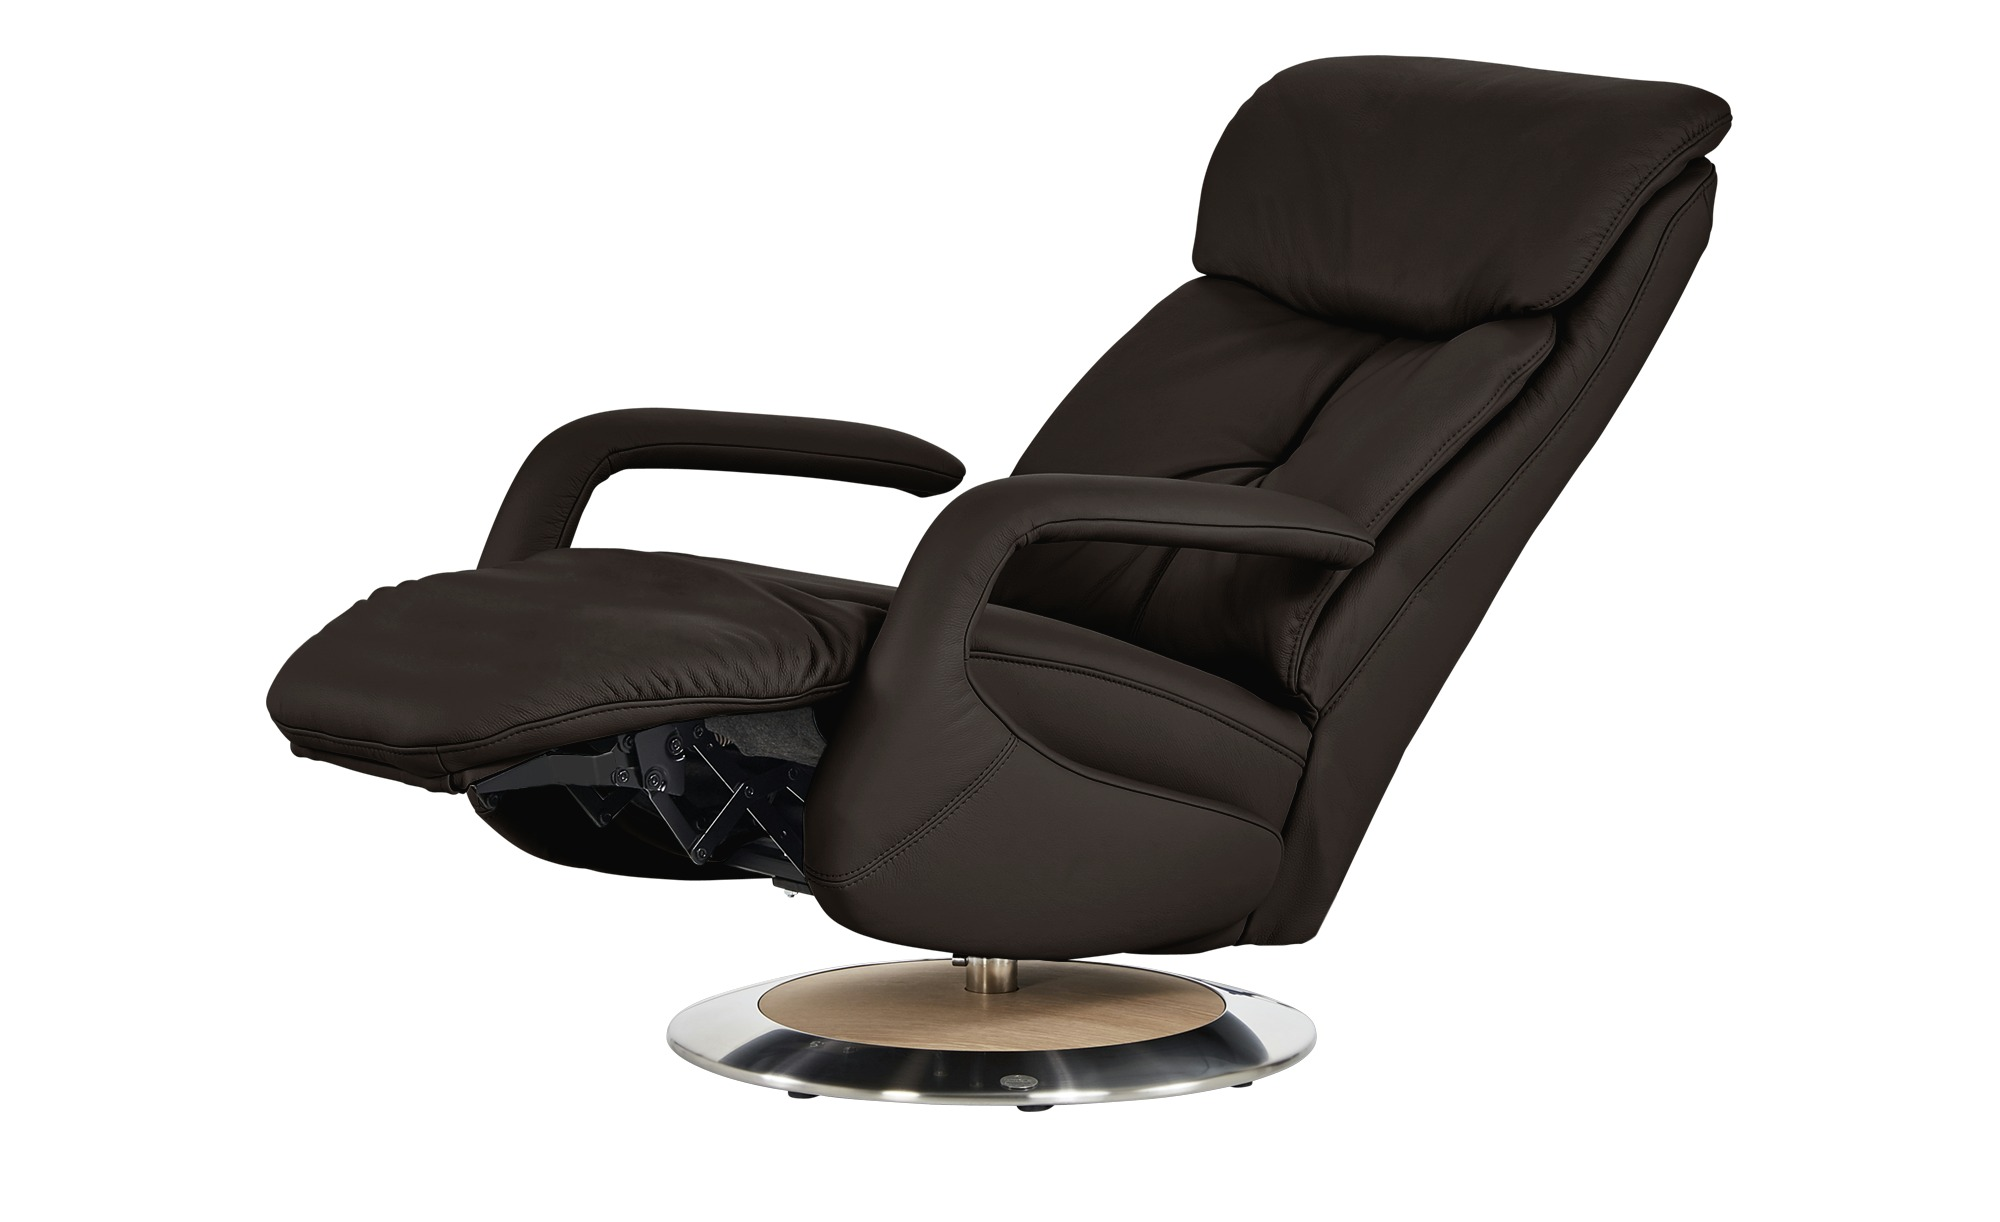 Relaxsessel braun - Leder Alea ¦ braun ¦ Maße (cm): B: 70 H: 111 T: 88 Polstermöbel > Sessel > Fernsehsessel - Höffner